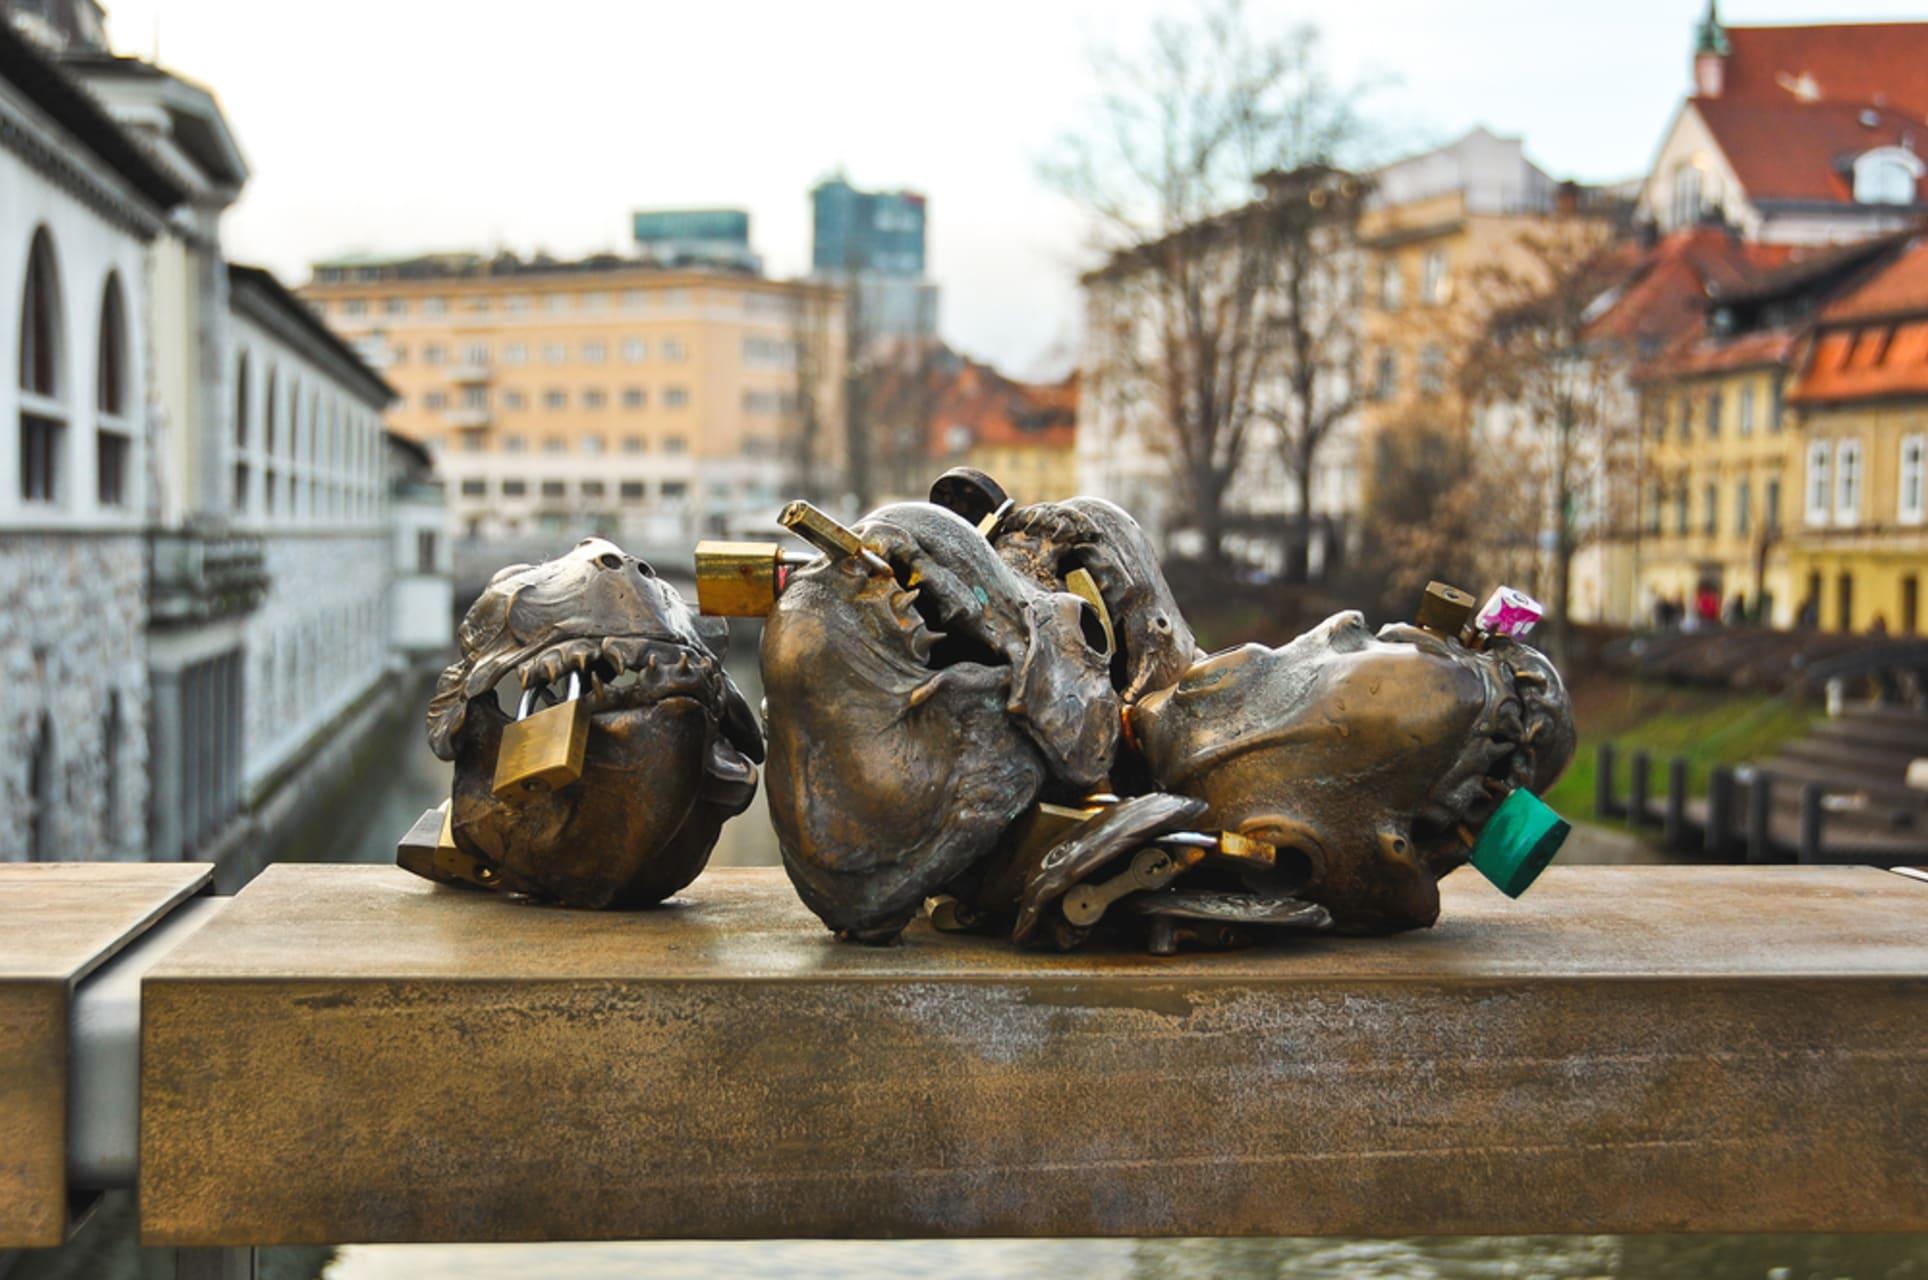 Ljubljana - The Stories and Contemporary Art of Ljubljana